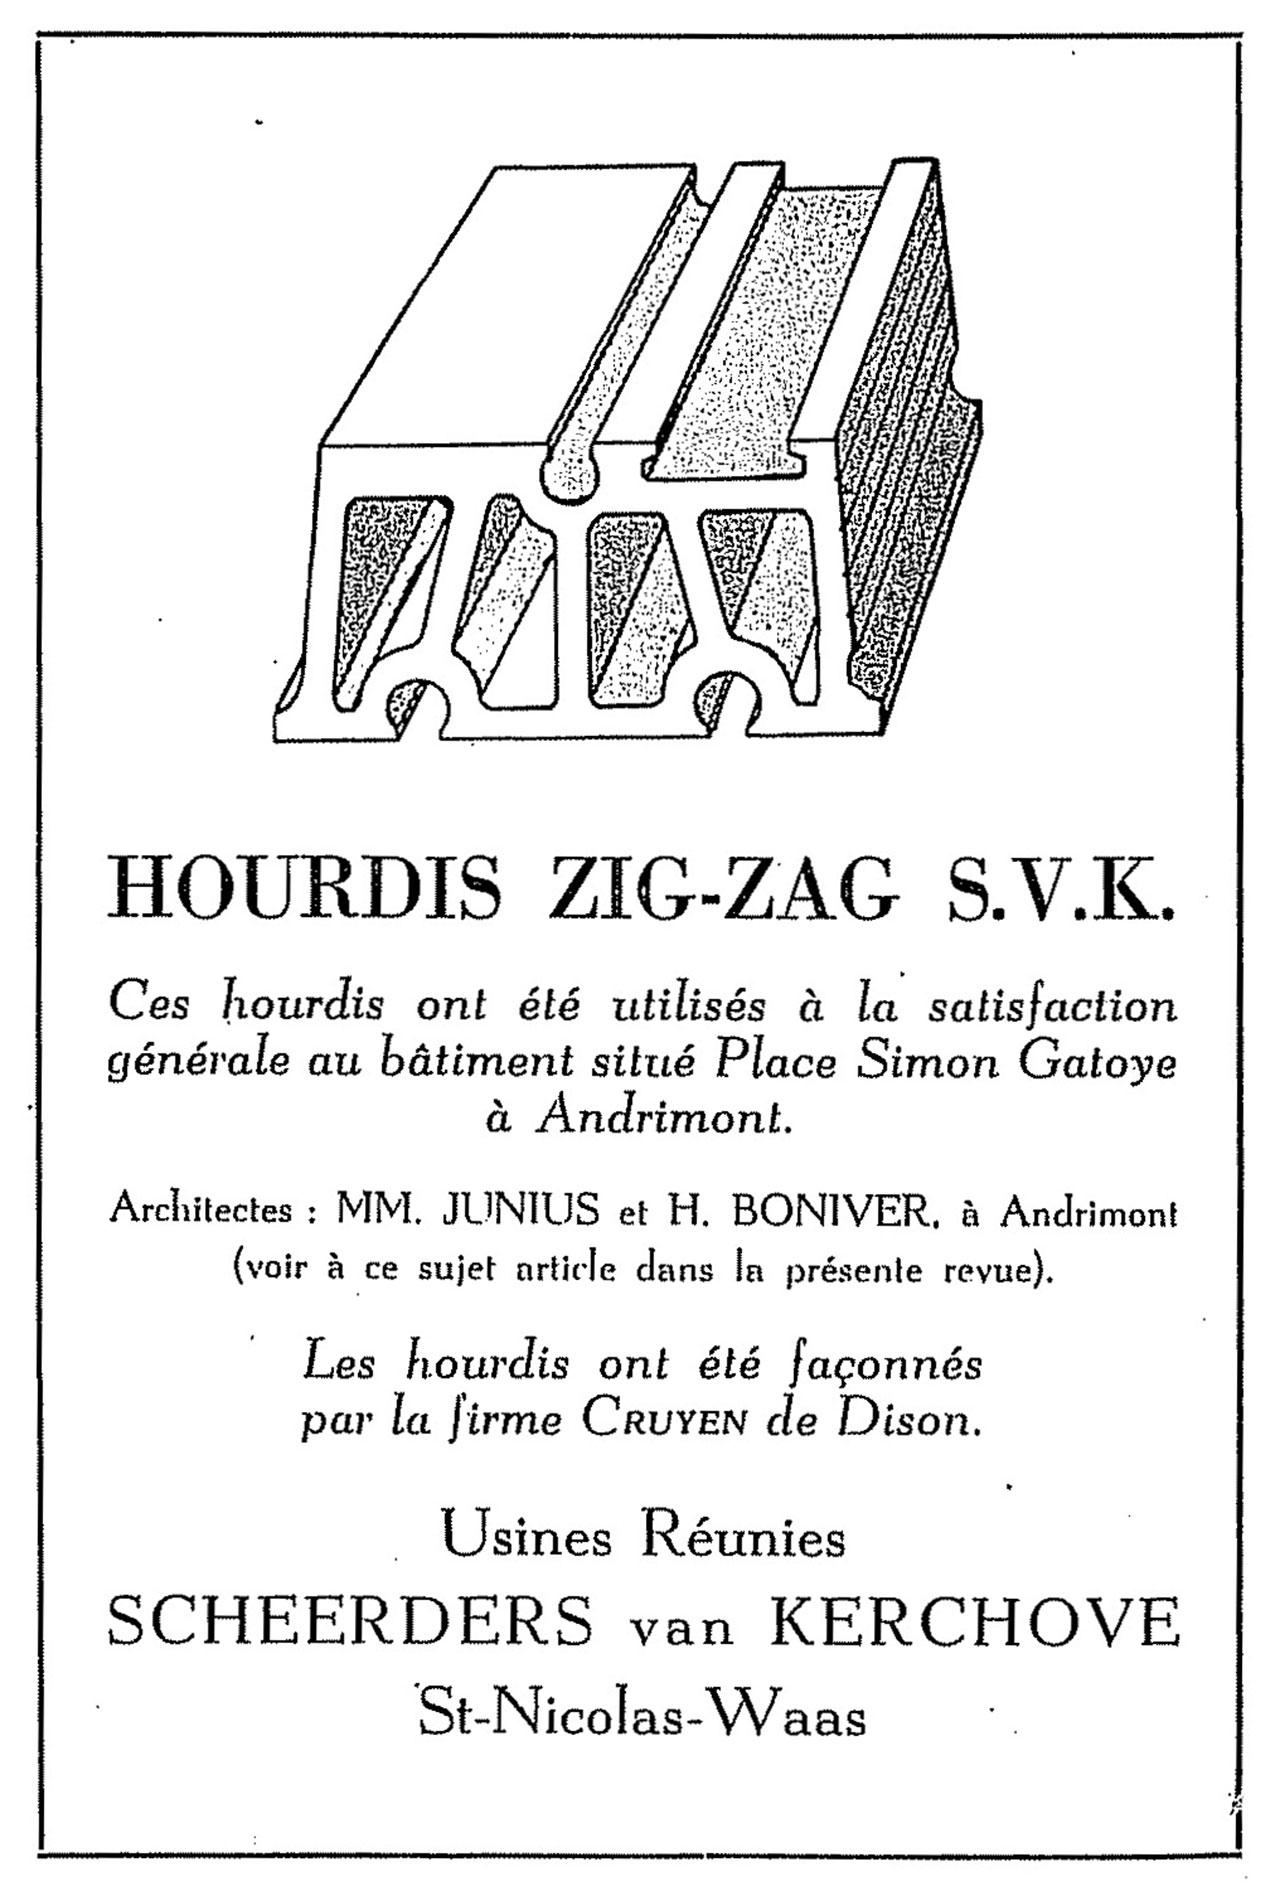 Hourdis Zig-Zag